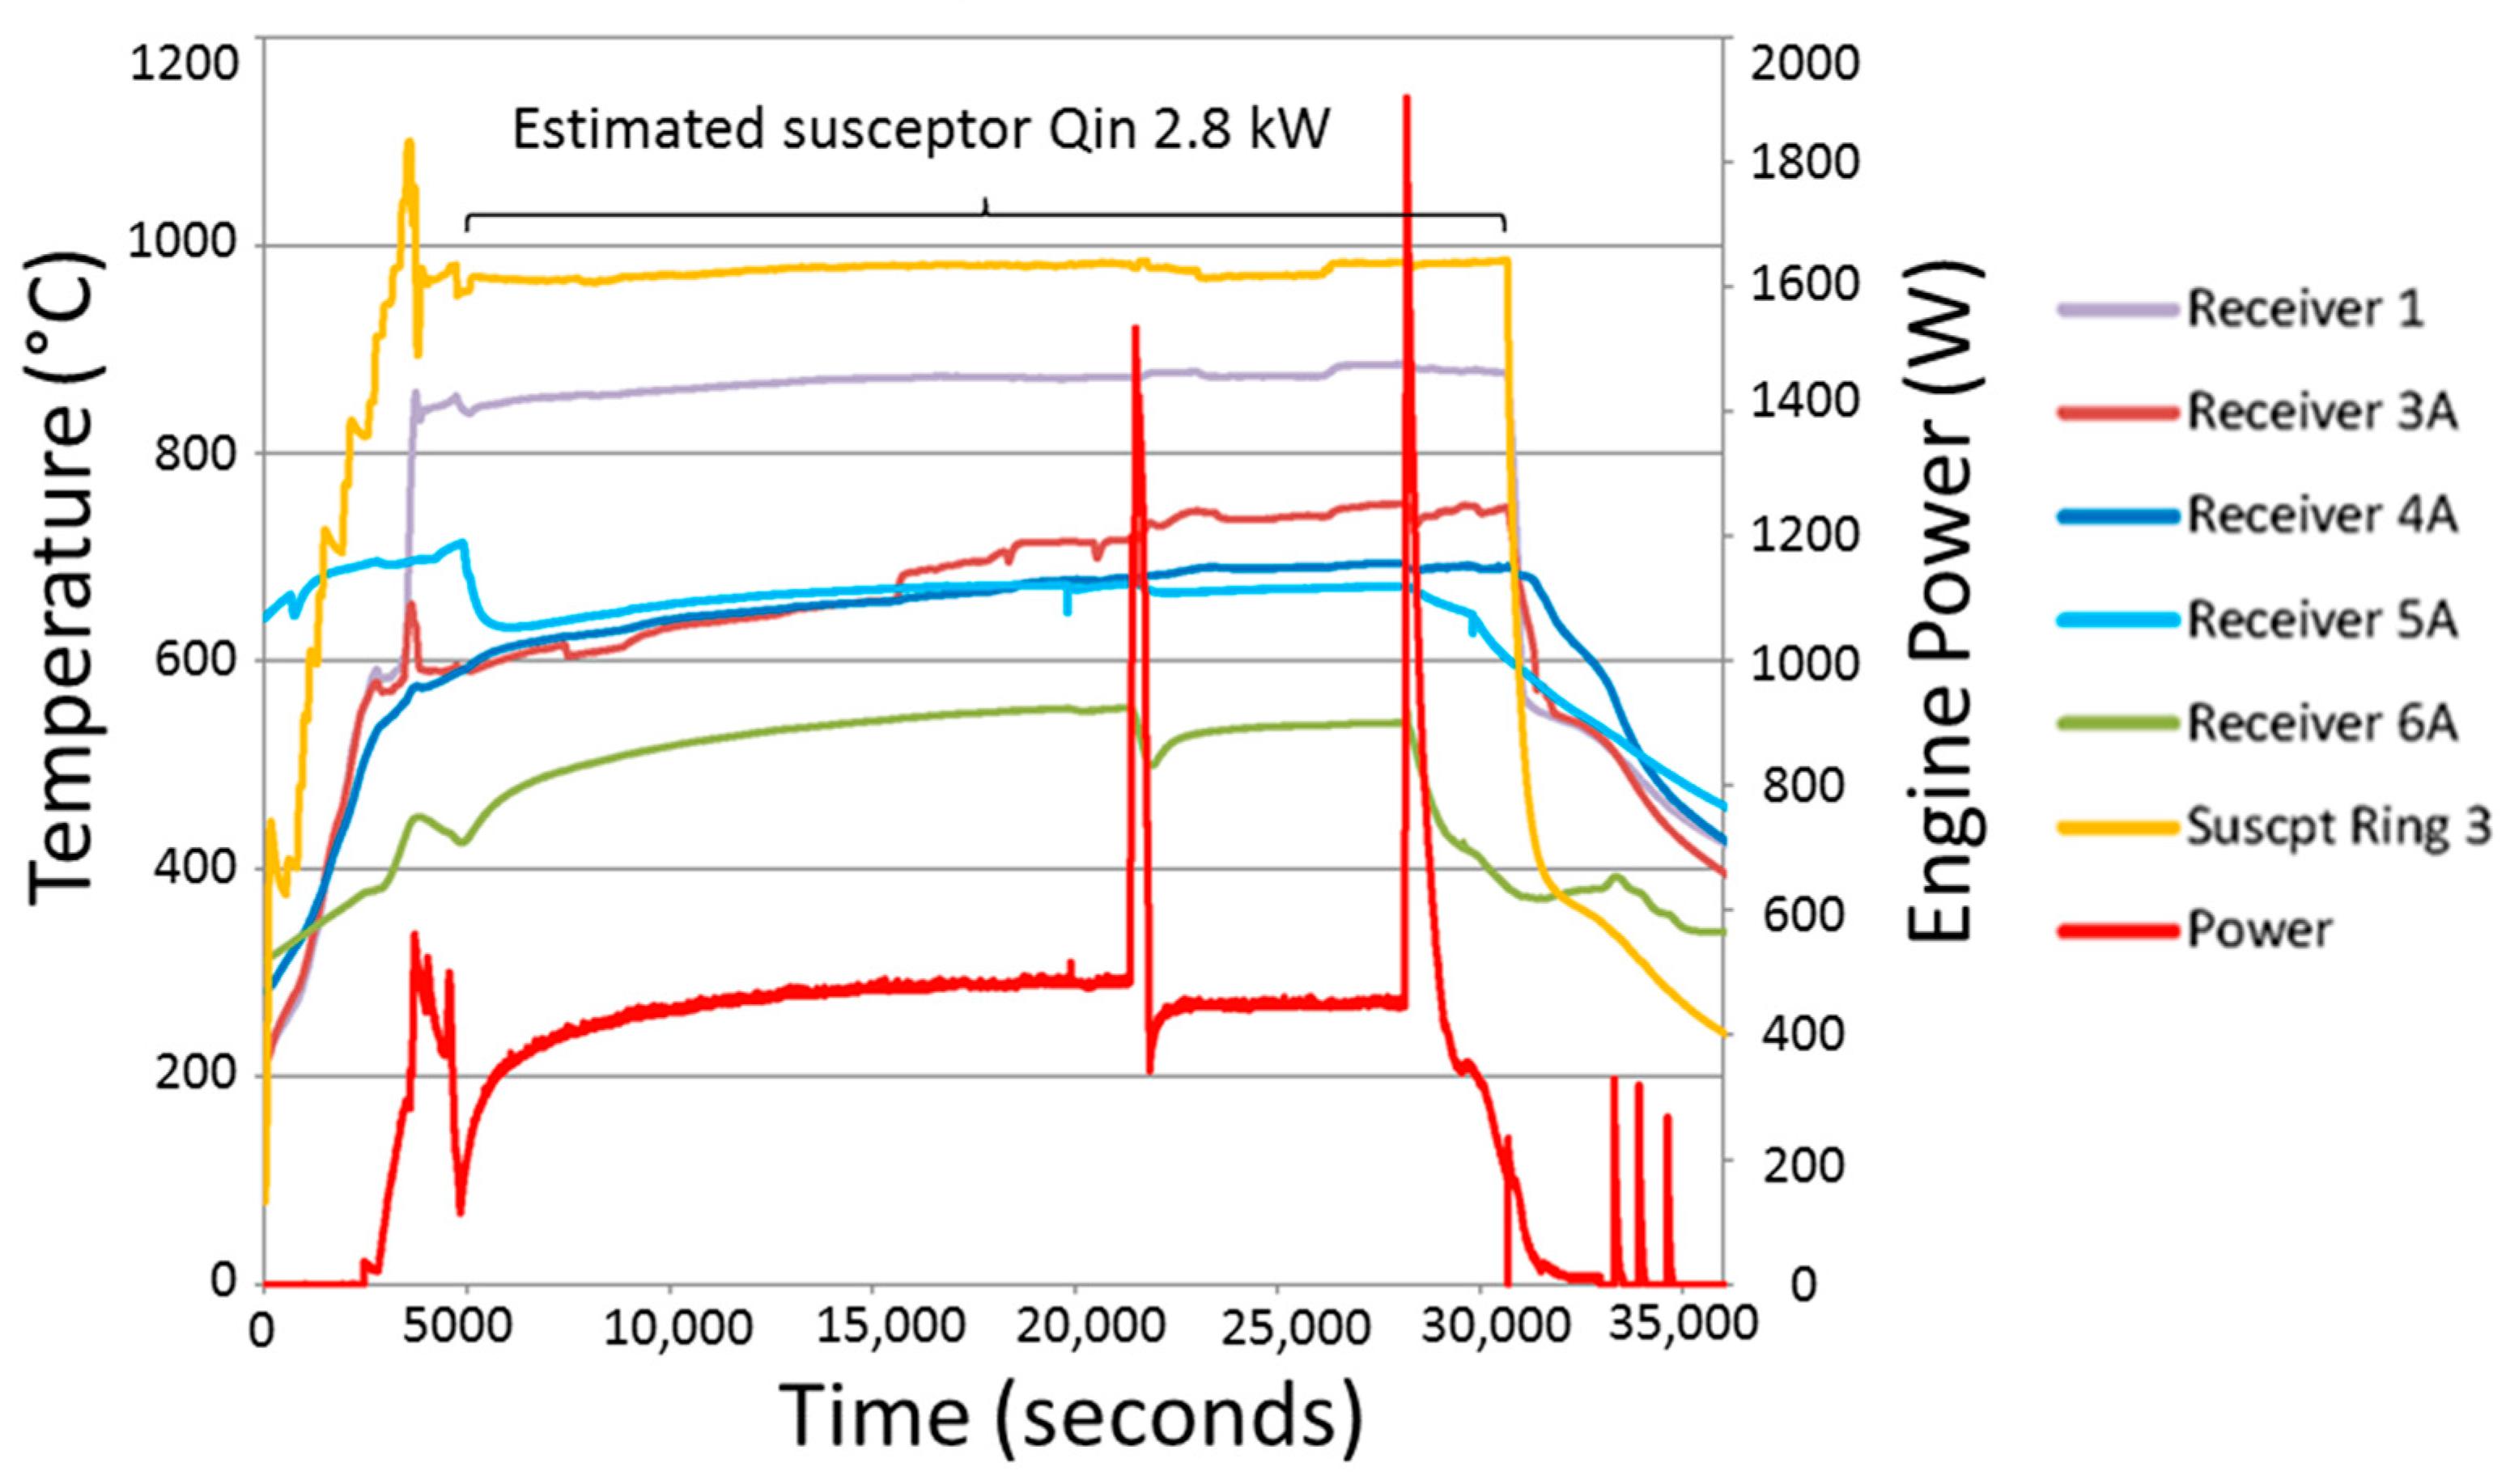 wiring diagram excel 33rko   26 wiring diagram images